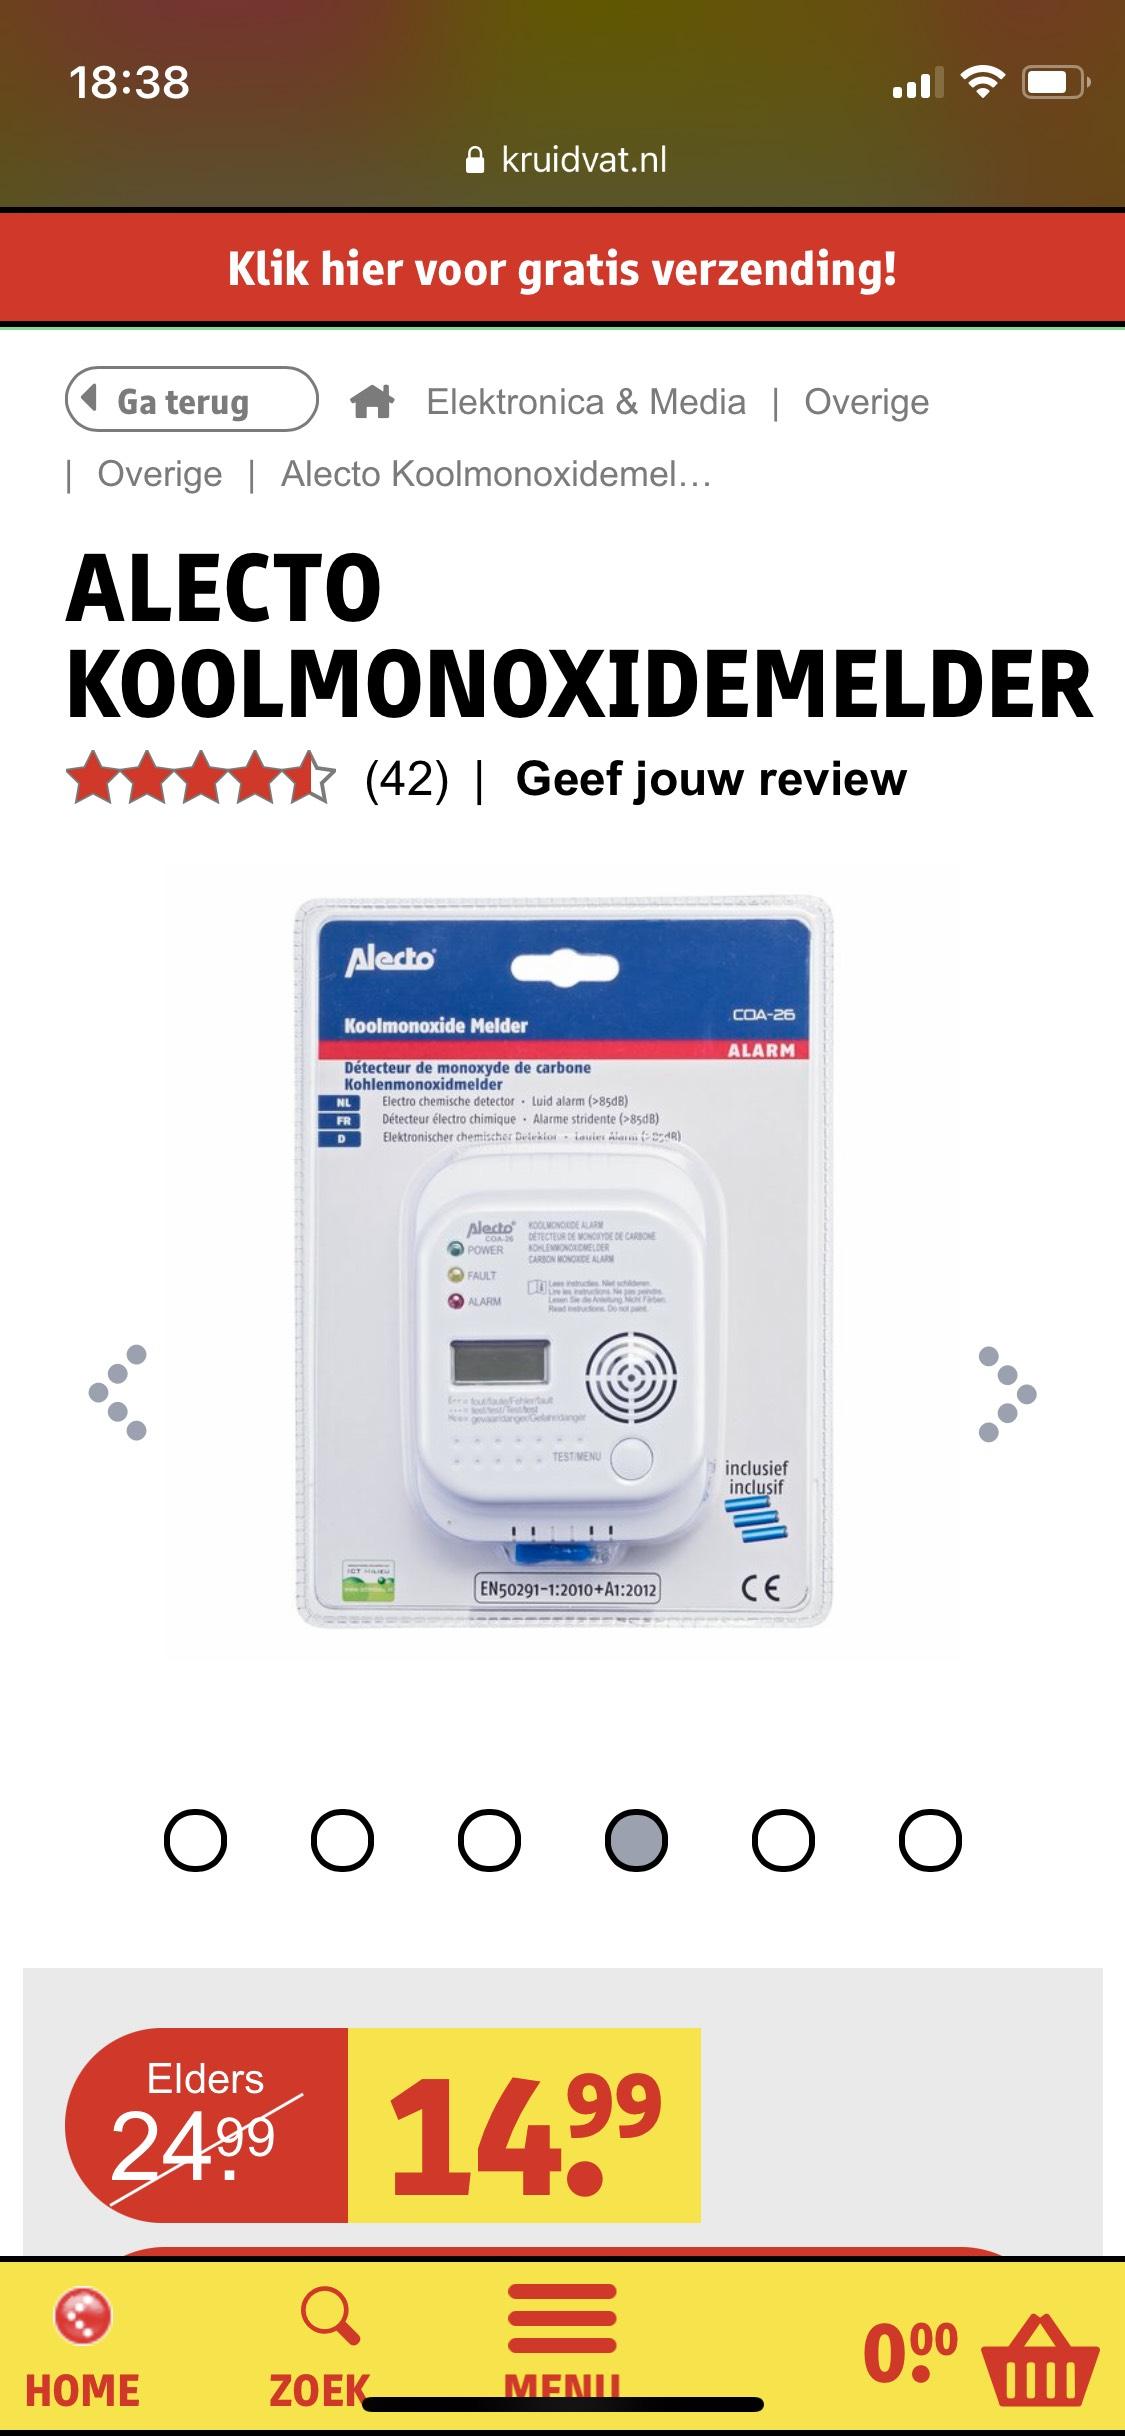 Alecto Koolmonoxidemelder (COA 26)